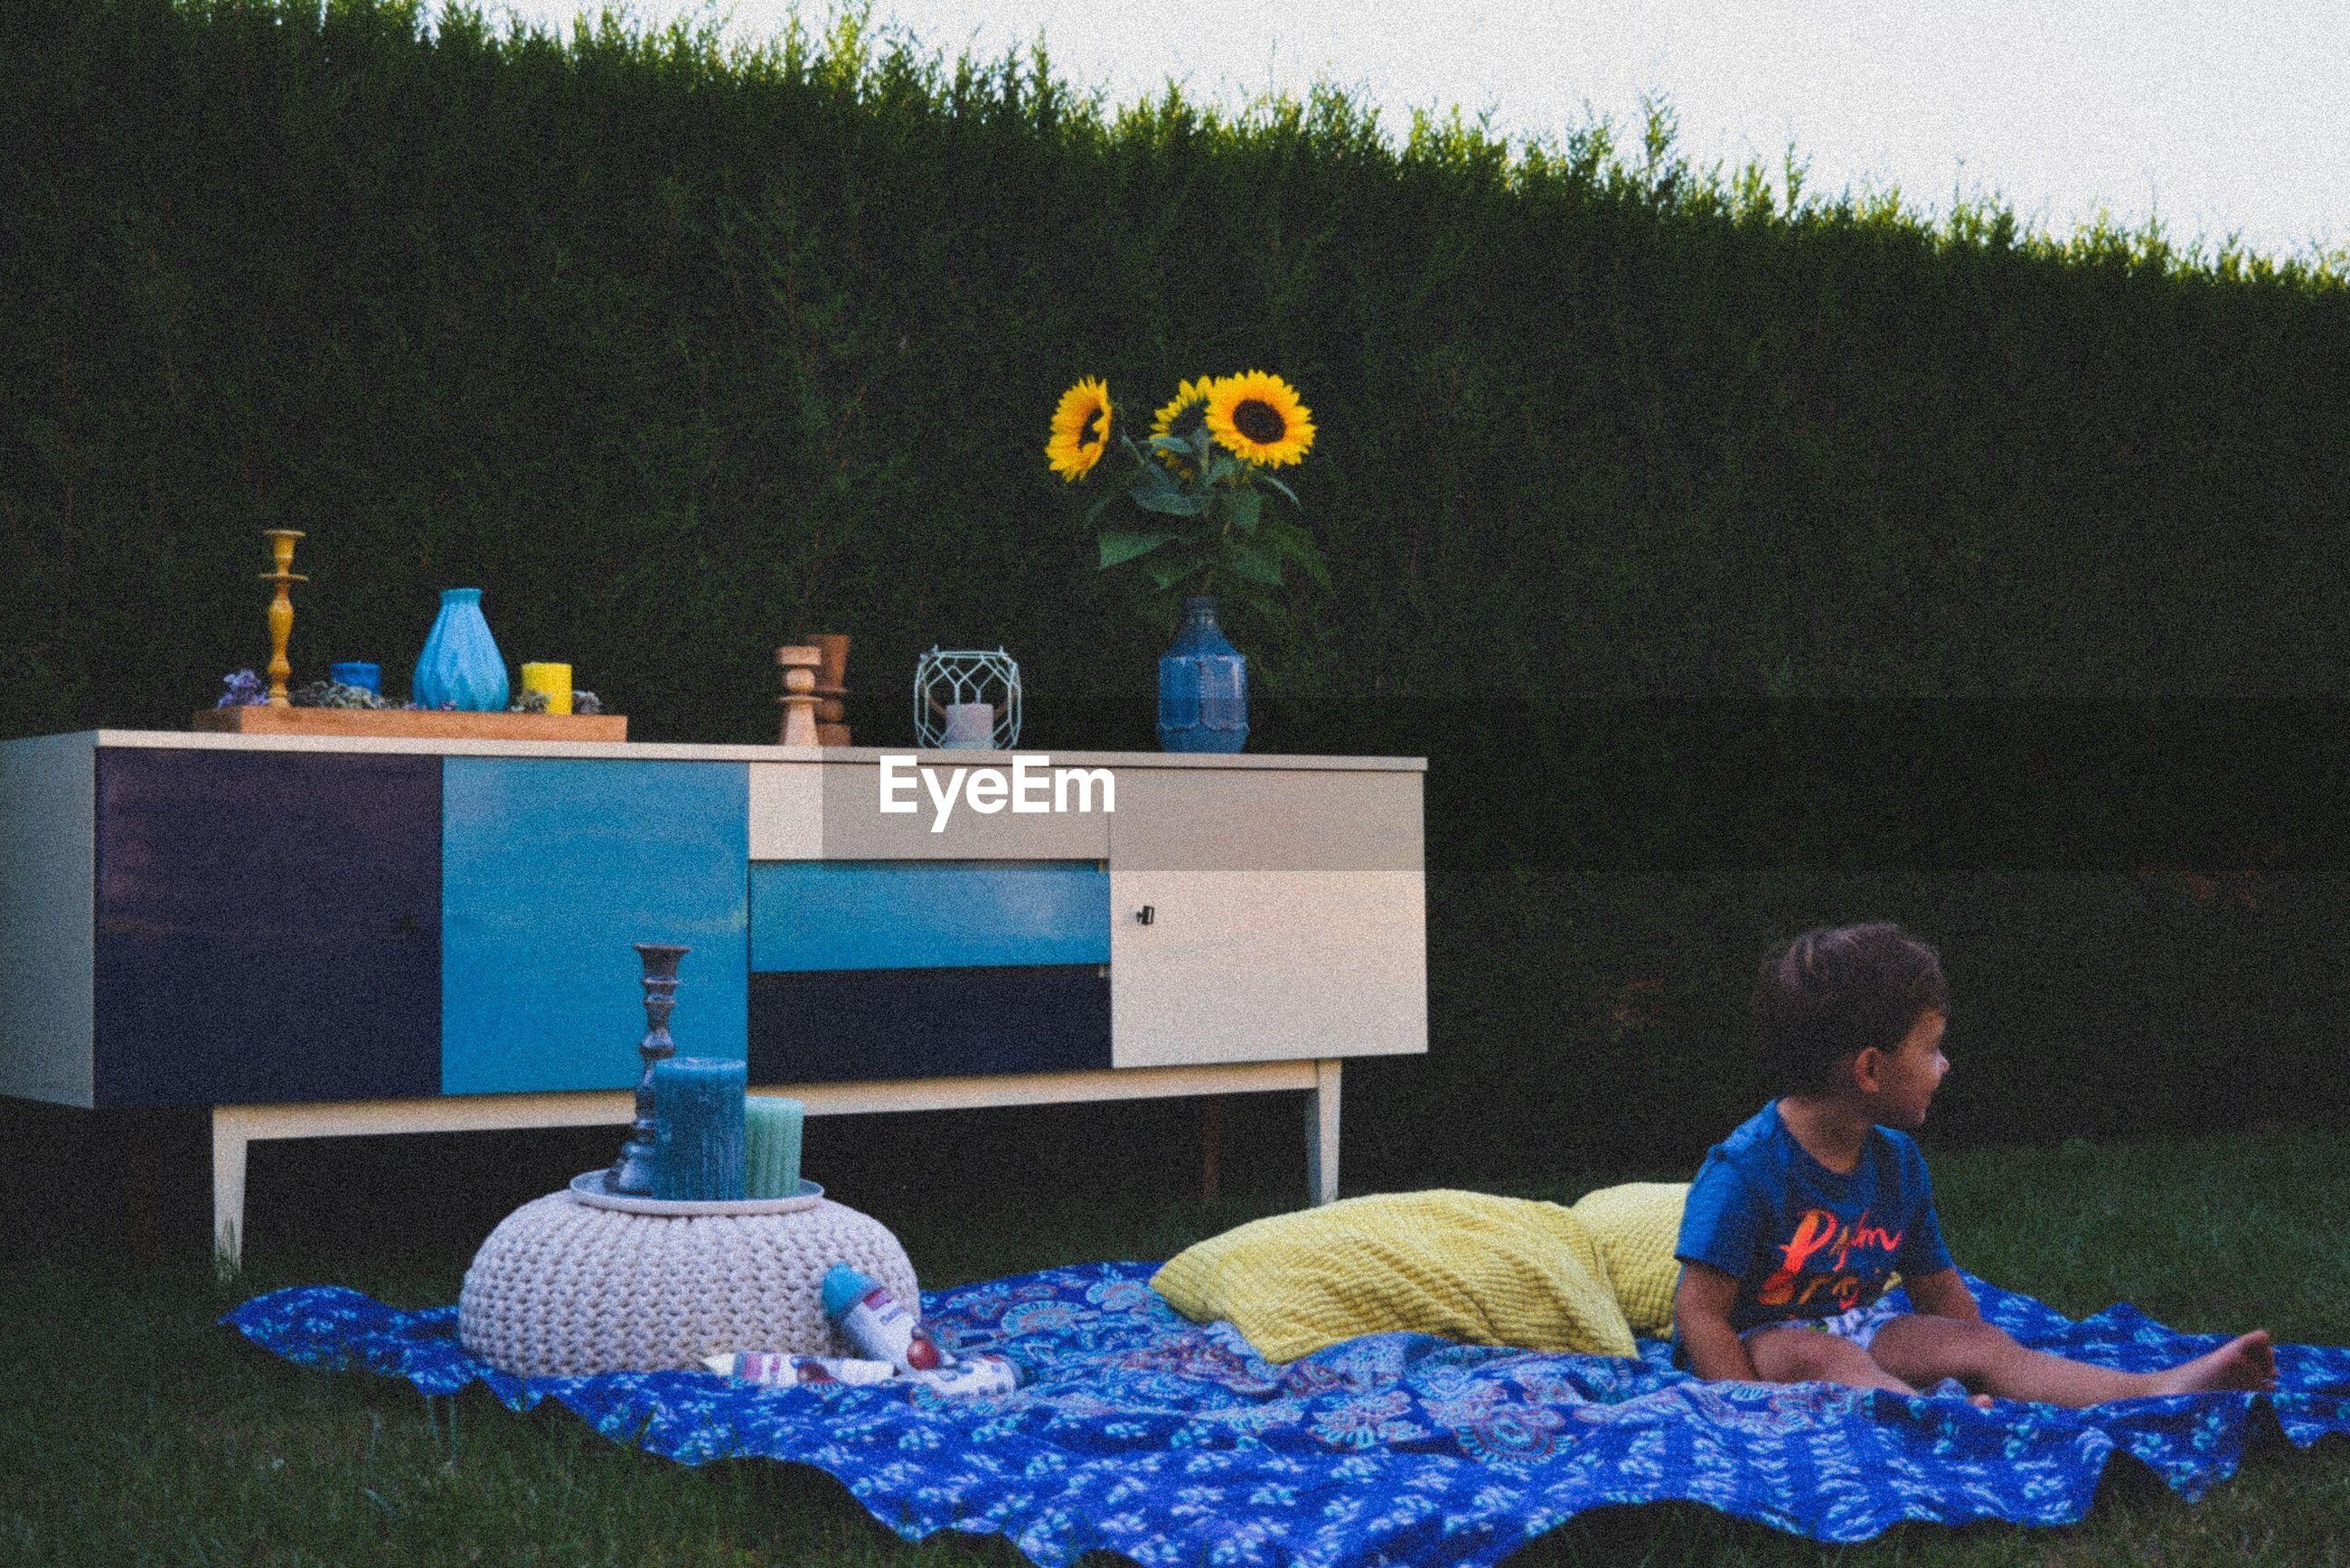 Boy sitting on picnic blanket in lawn